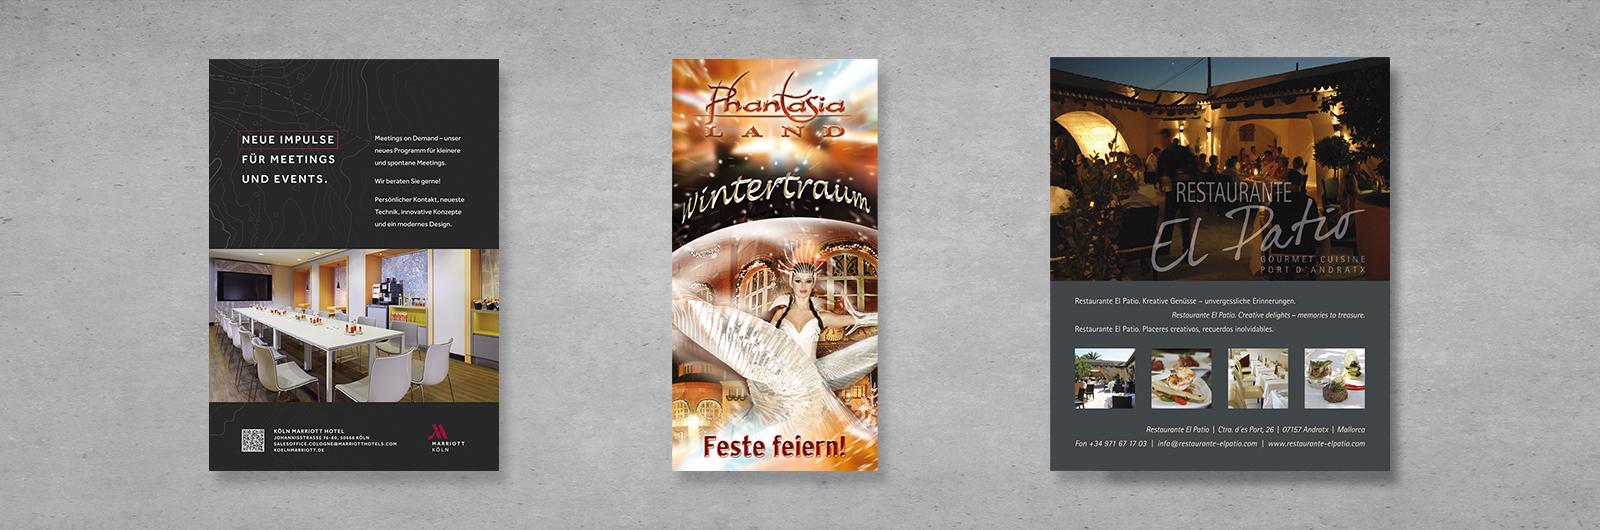 fernandez-design-portfolio-4